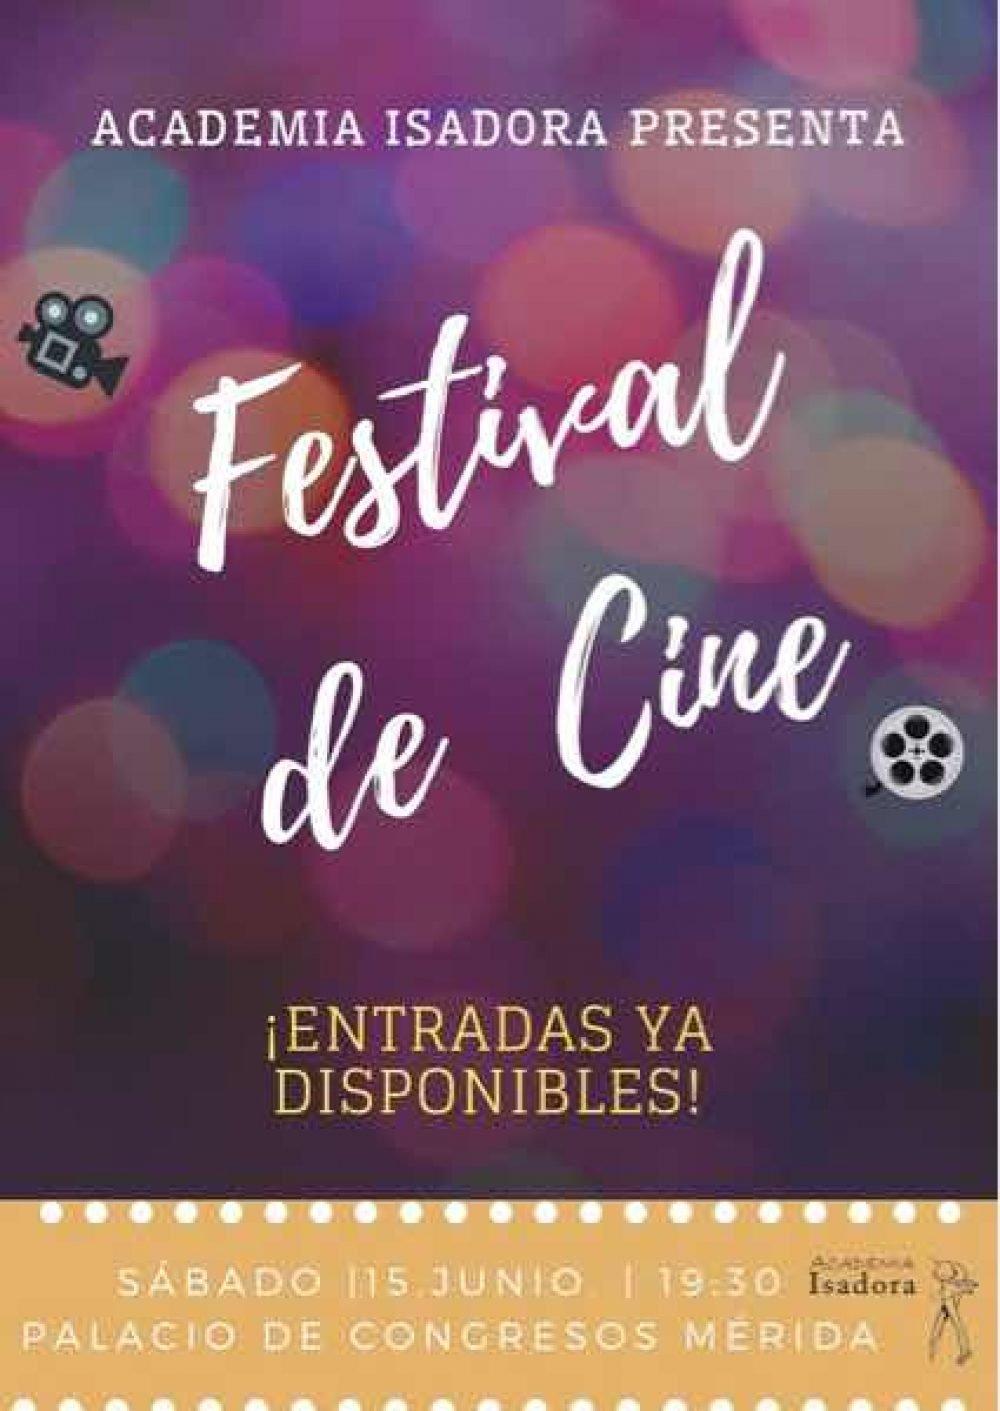 Festival de Cine, Academia ISADORA